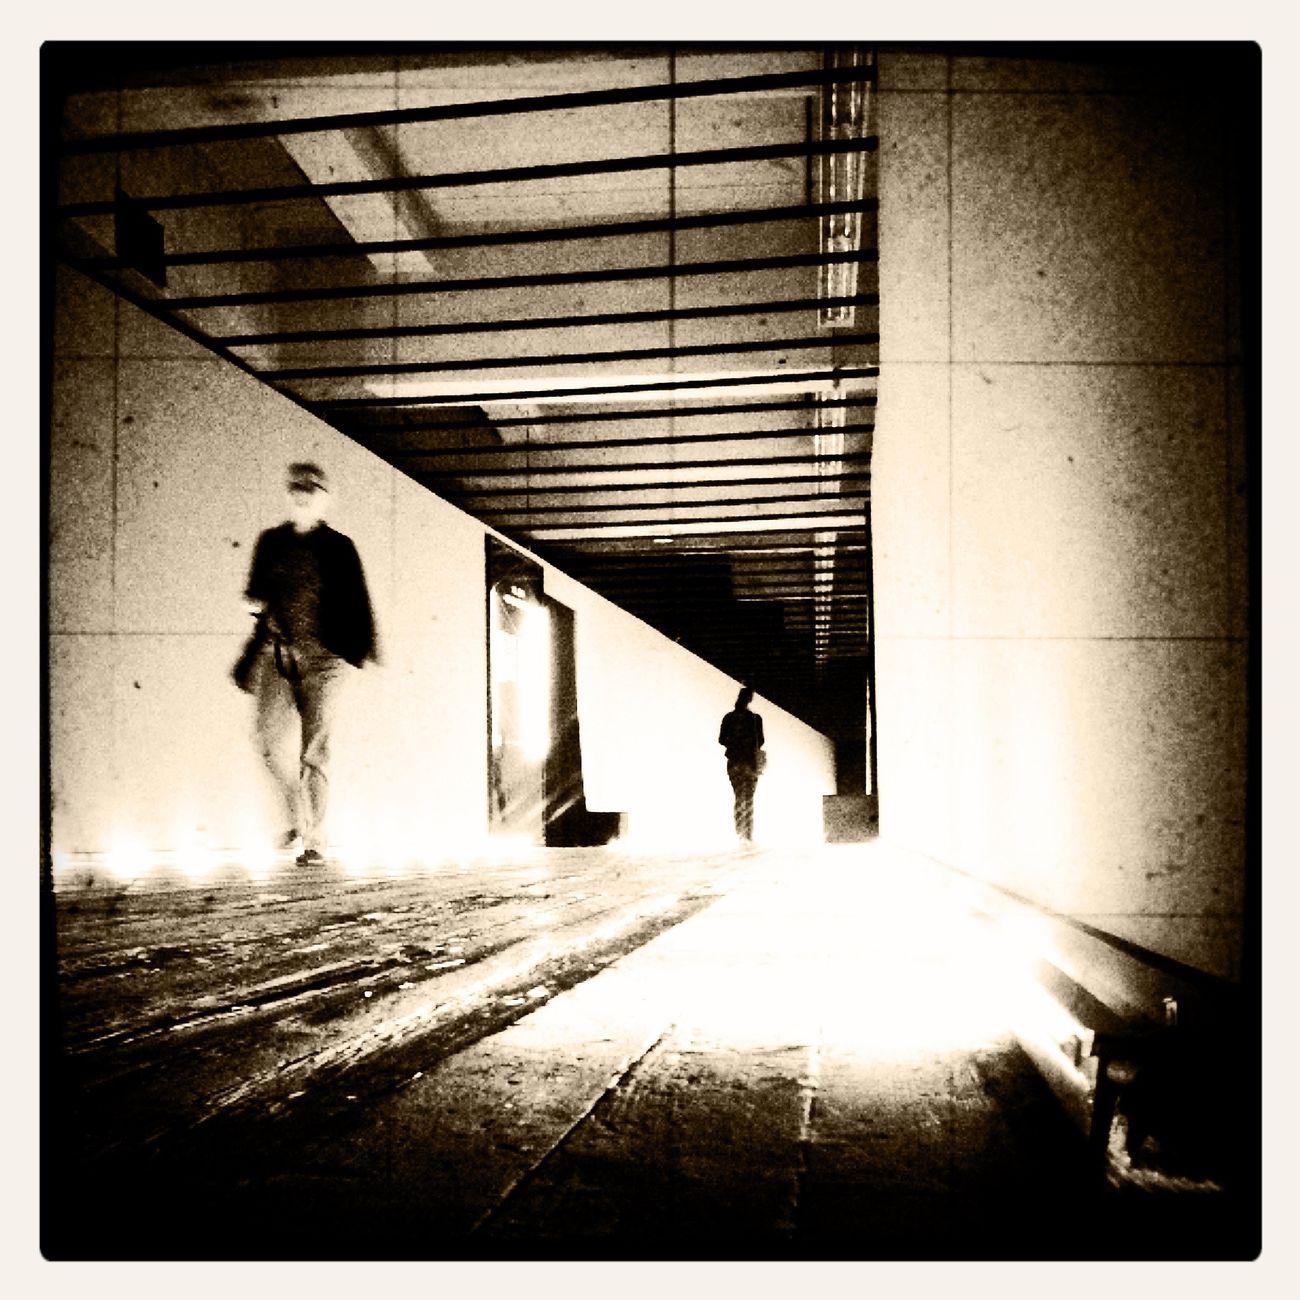 Monochrome Blackandwhite Photography